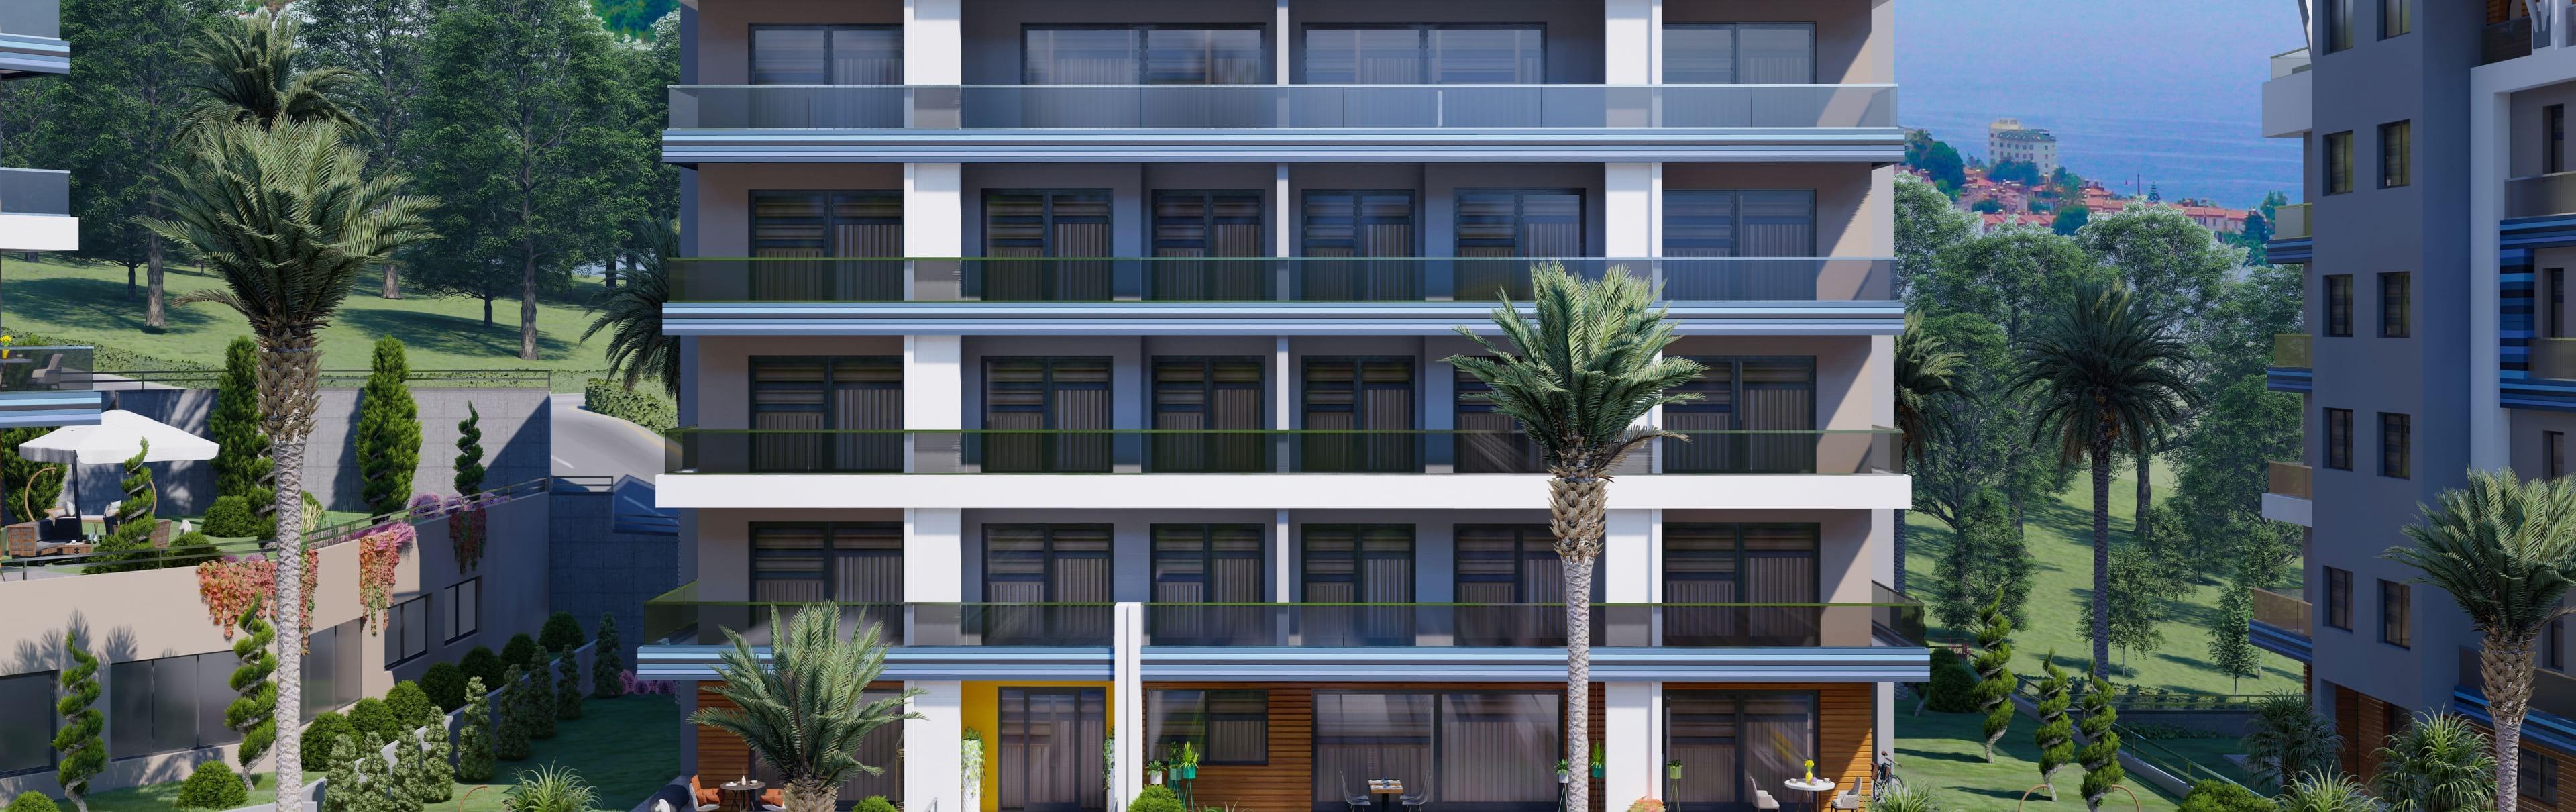 Eco Blue Residence